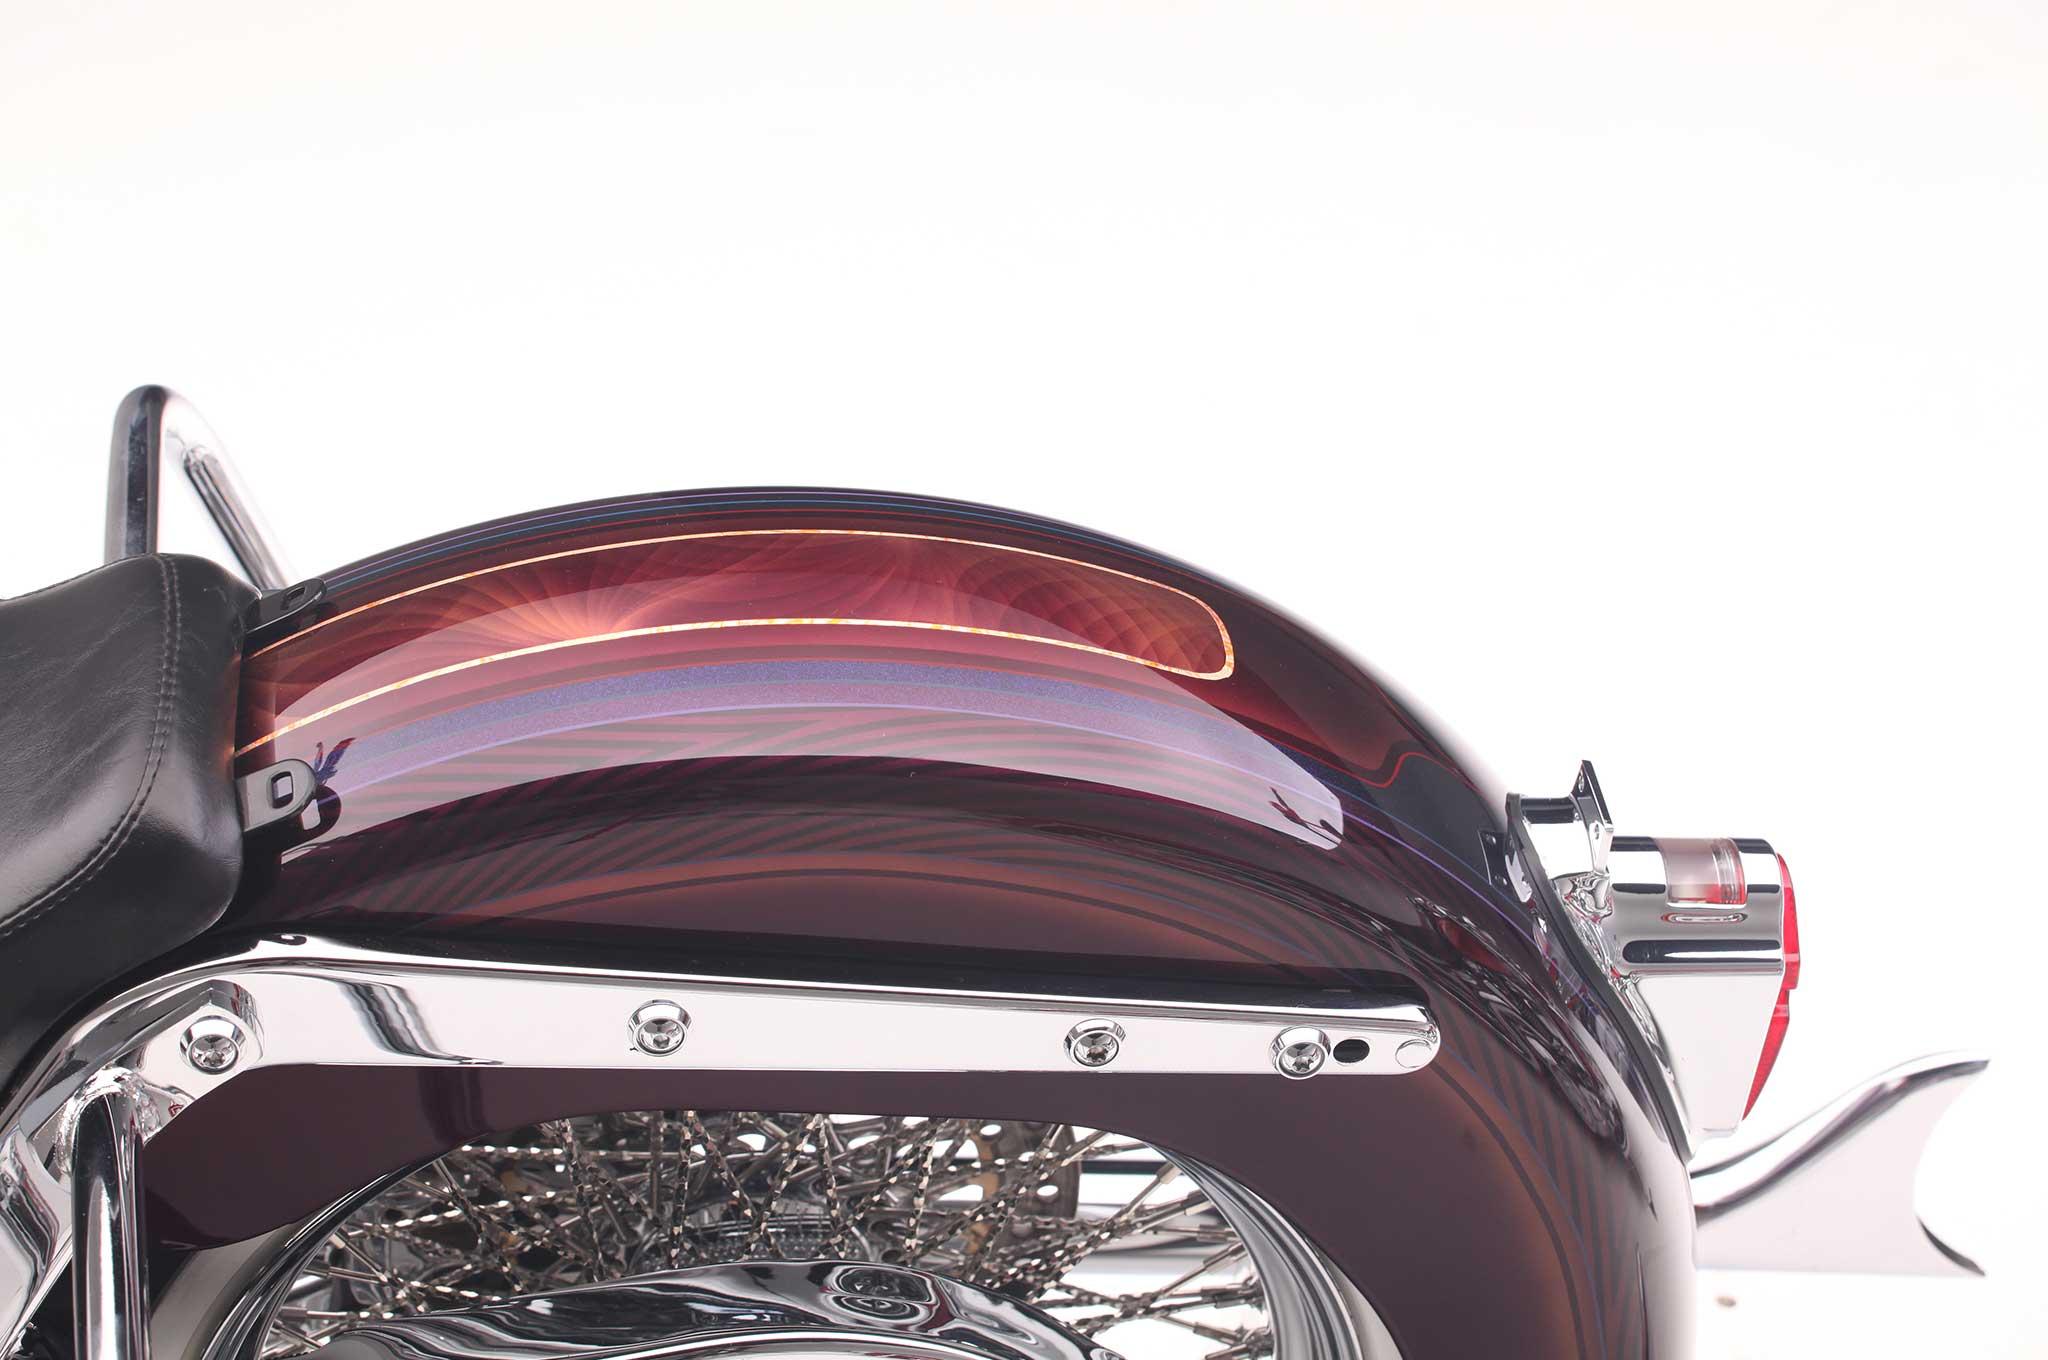 Harley Davidson Fender Bib Softail Best 2018 Heritage Clic Deluxe Rear